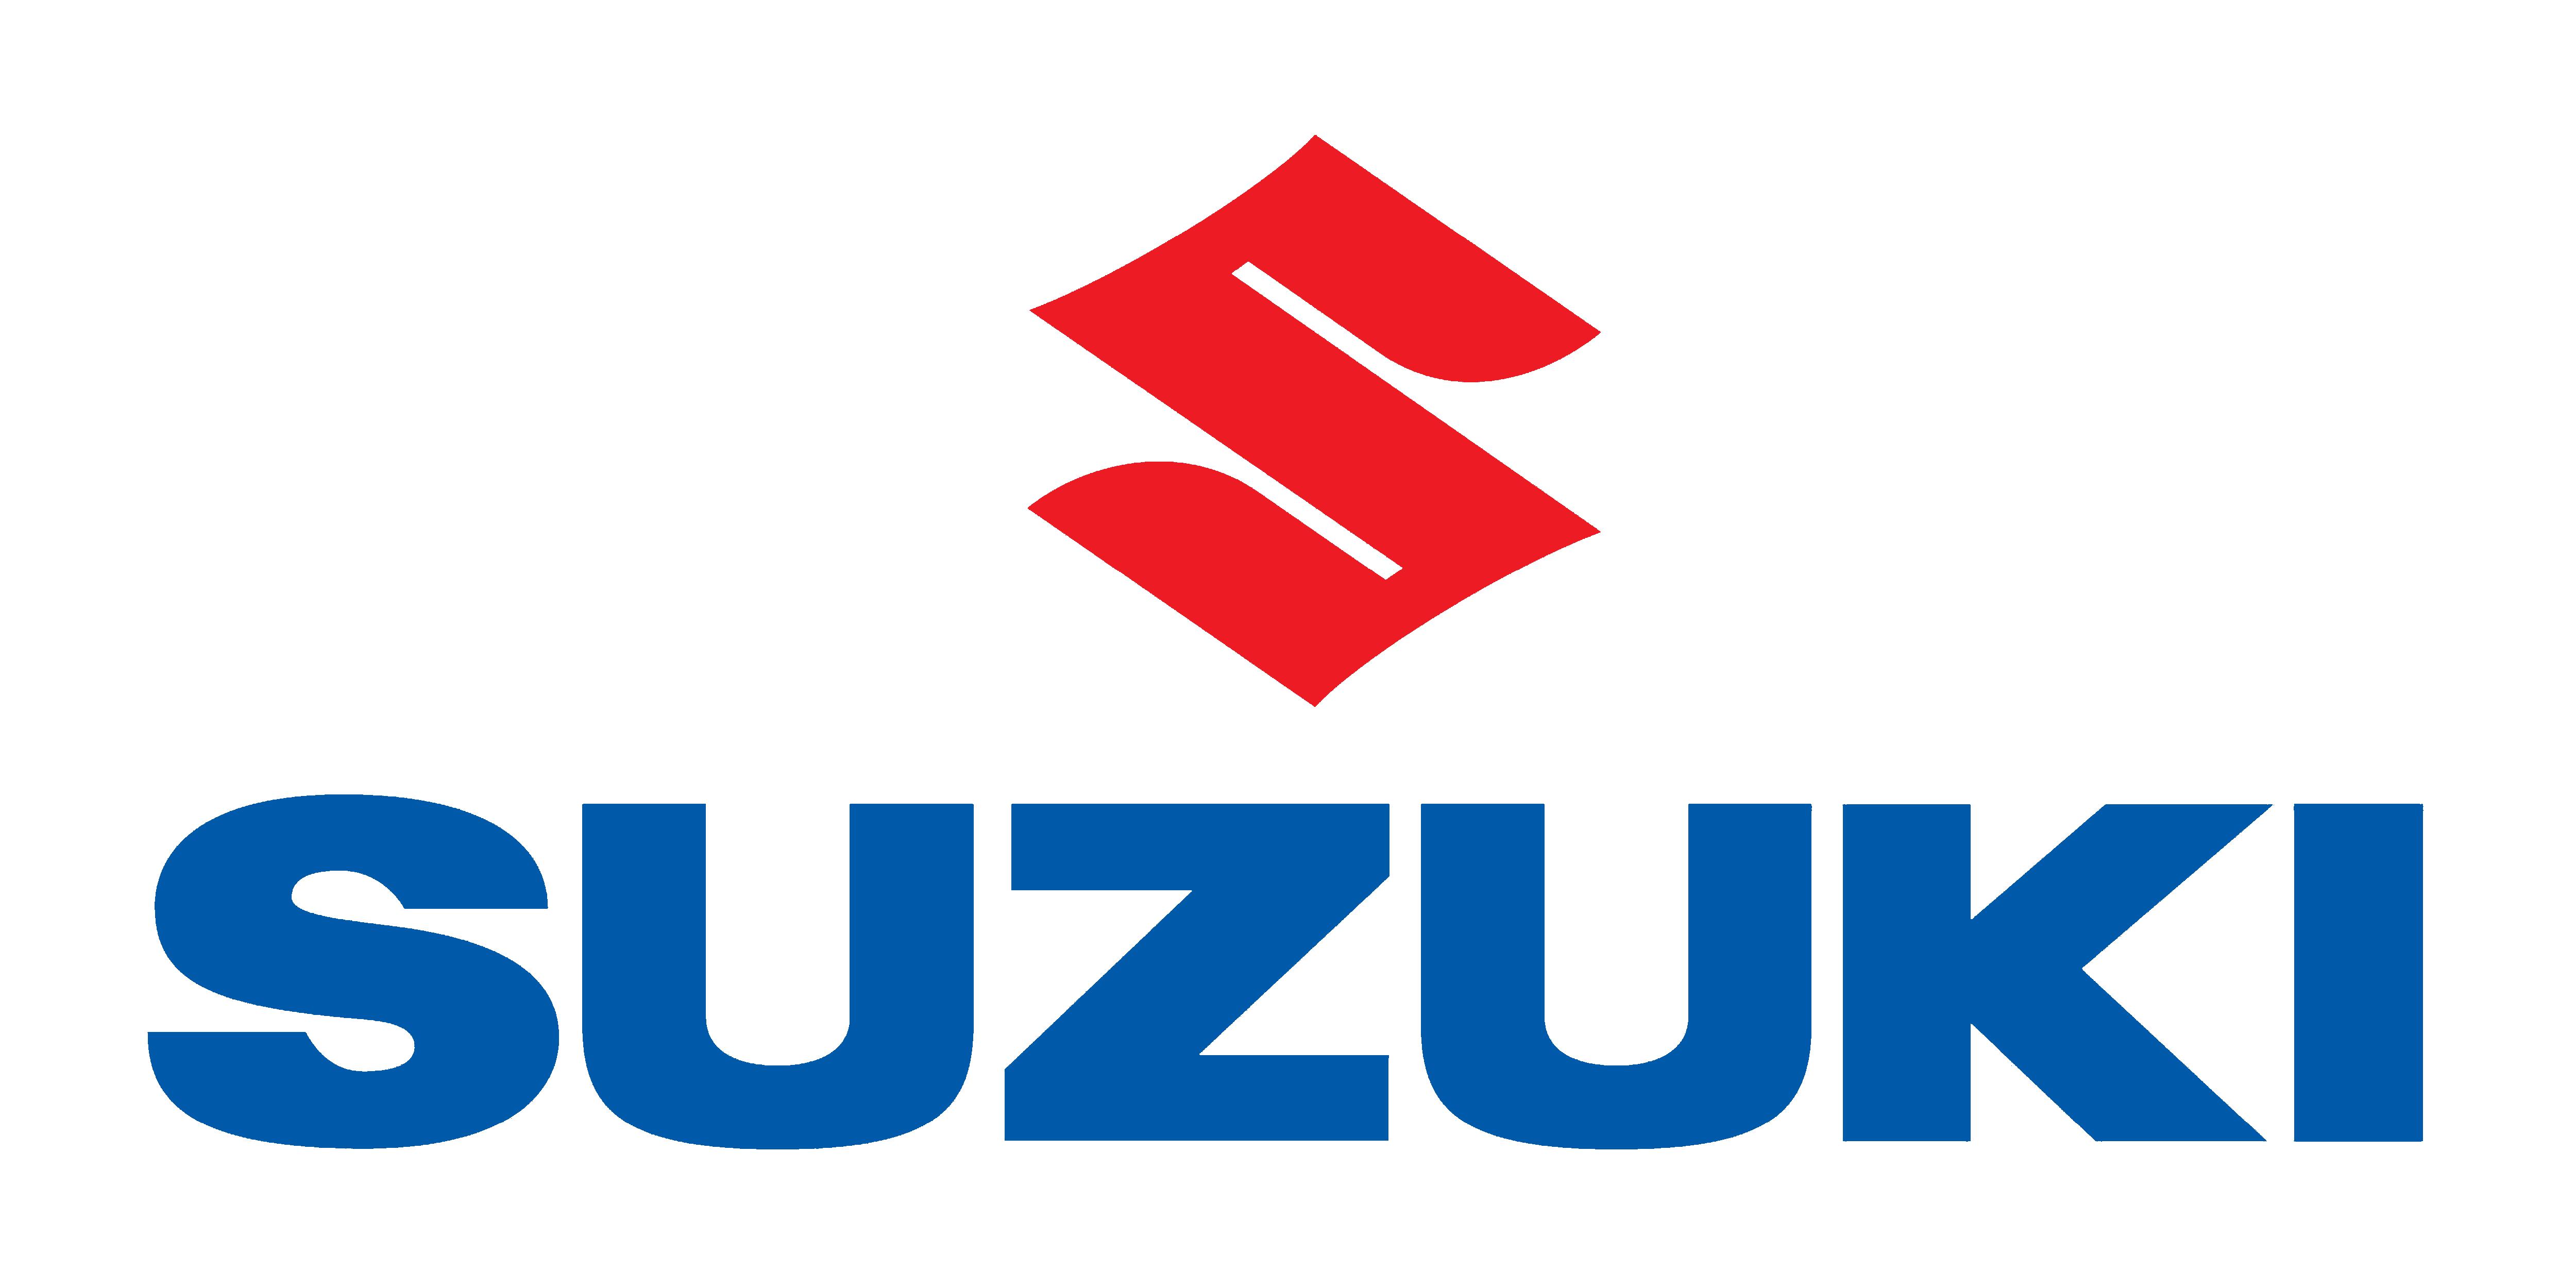 Suzuki HD PNG